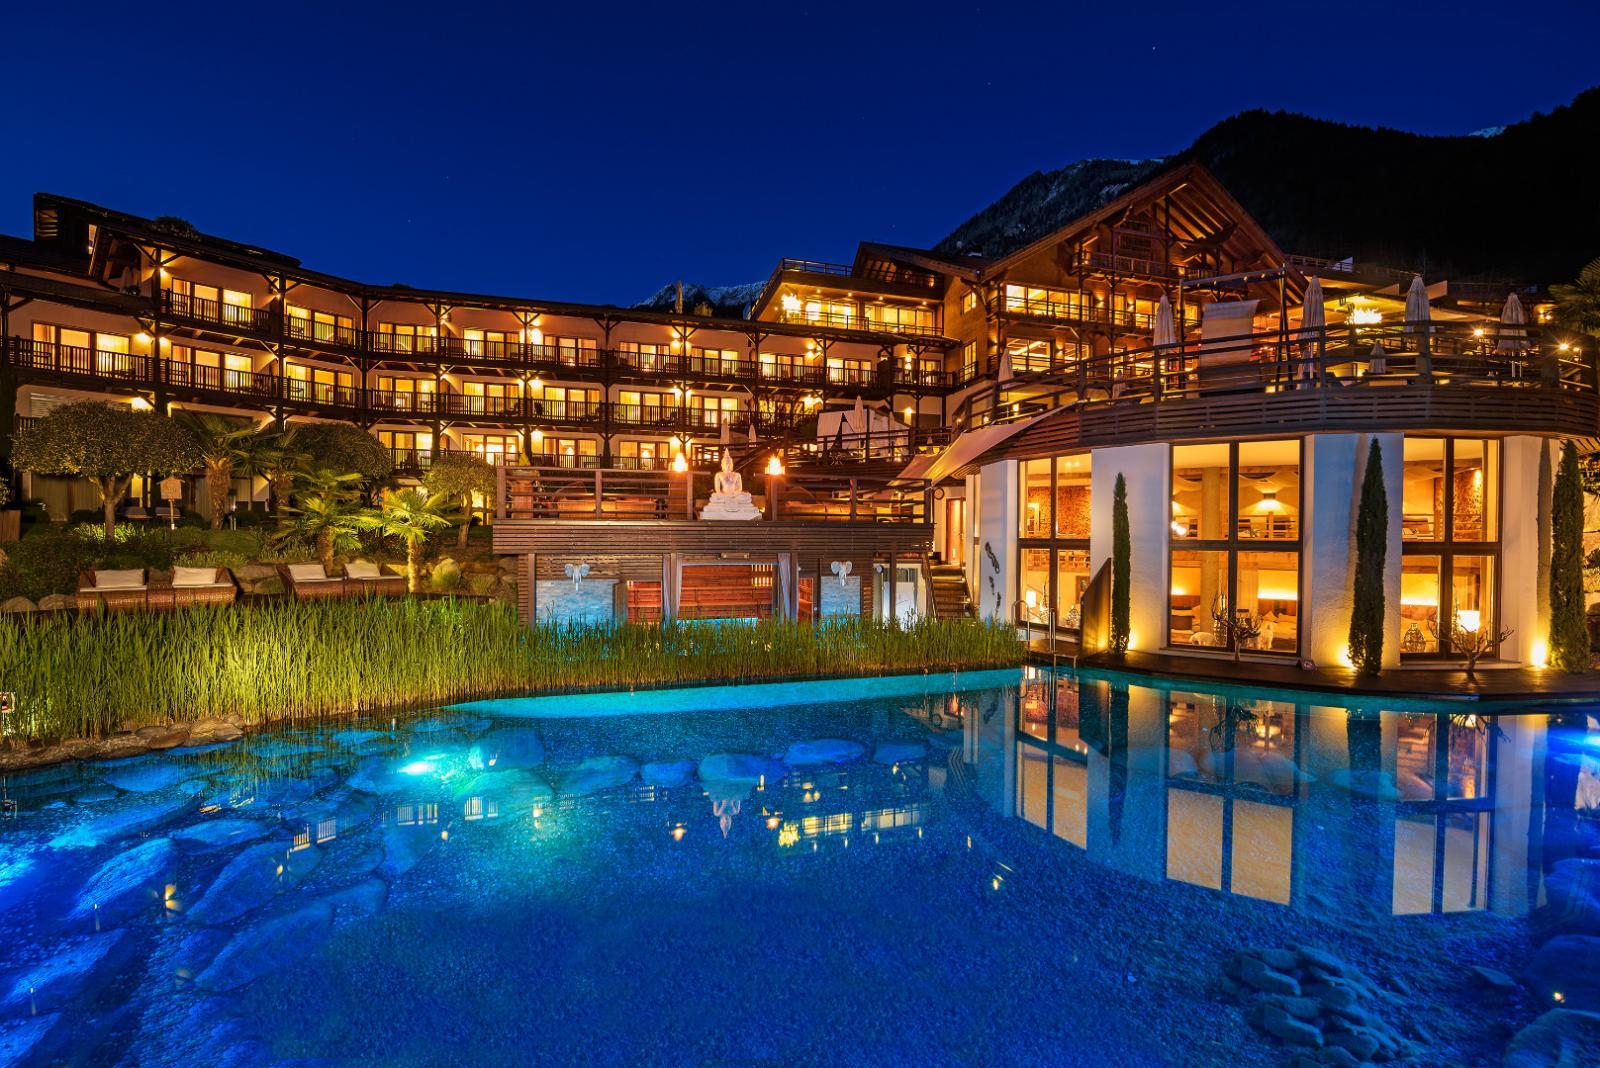 Golf spa resort andreus bilder vom wellnesshotel for Design hotel 5 stelle